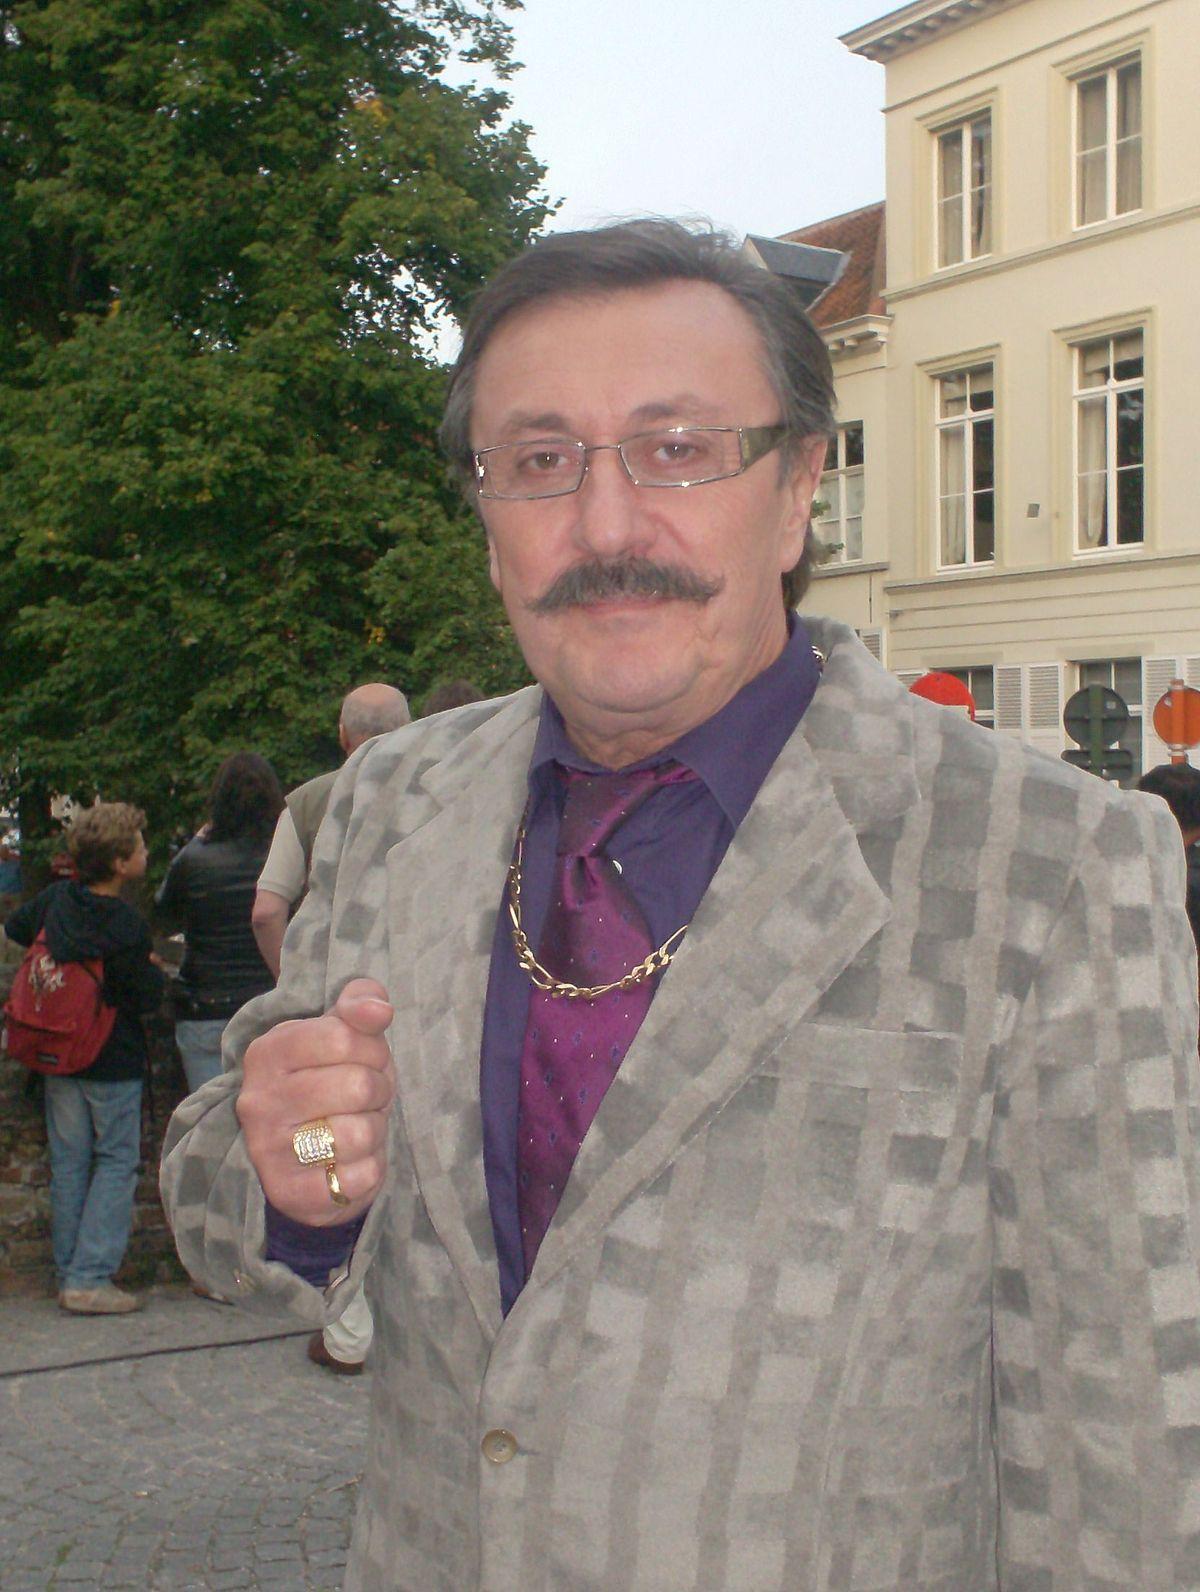 Marc De Caf Ef Bf Bd Arbre Fruit Ef Bf Bd